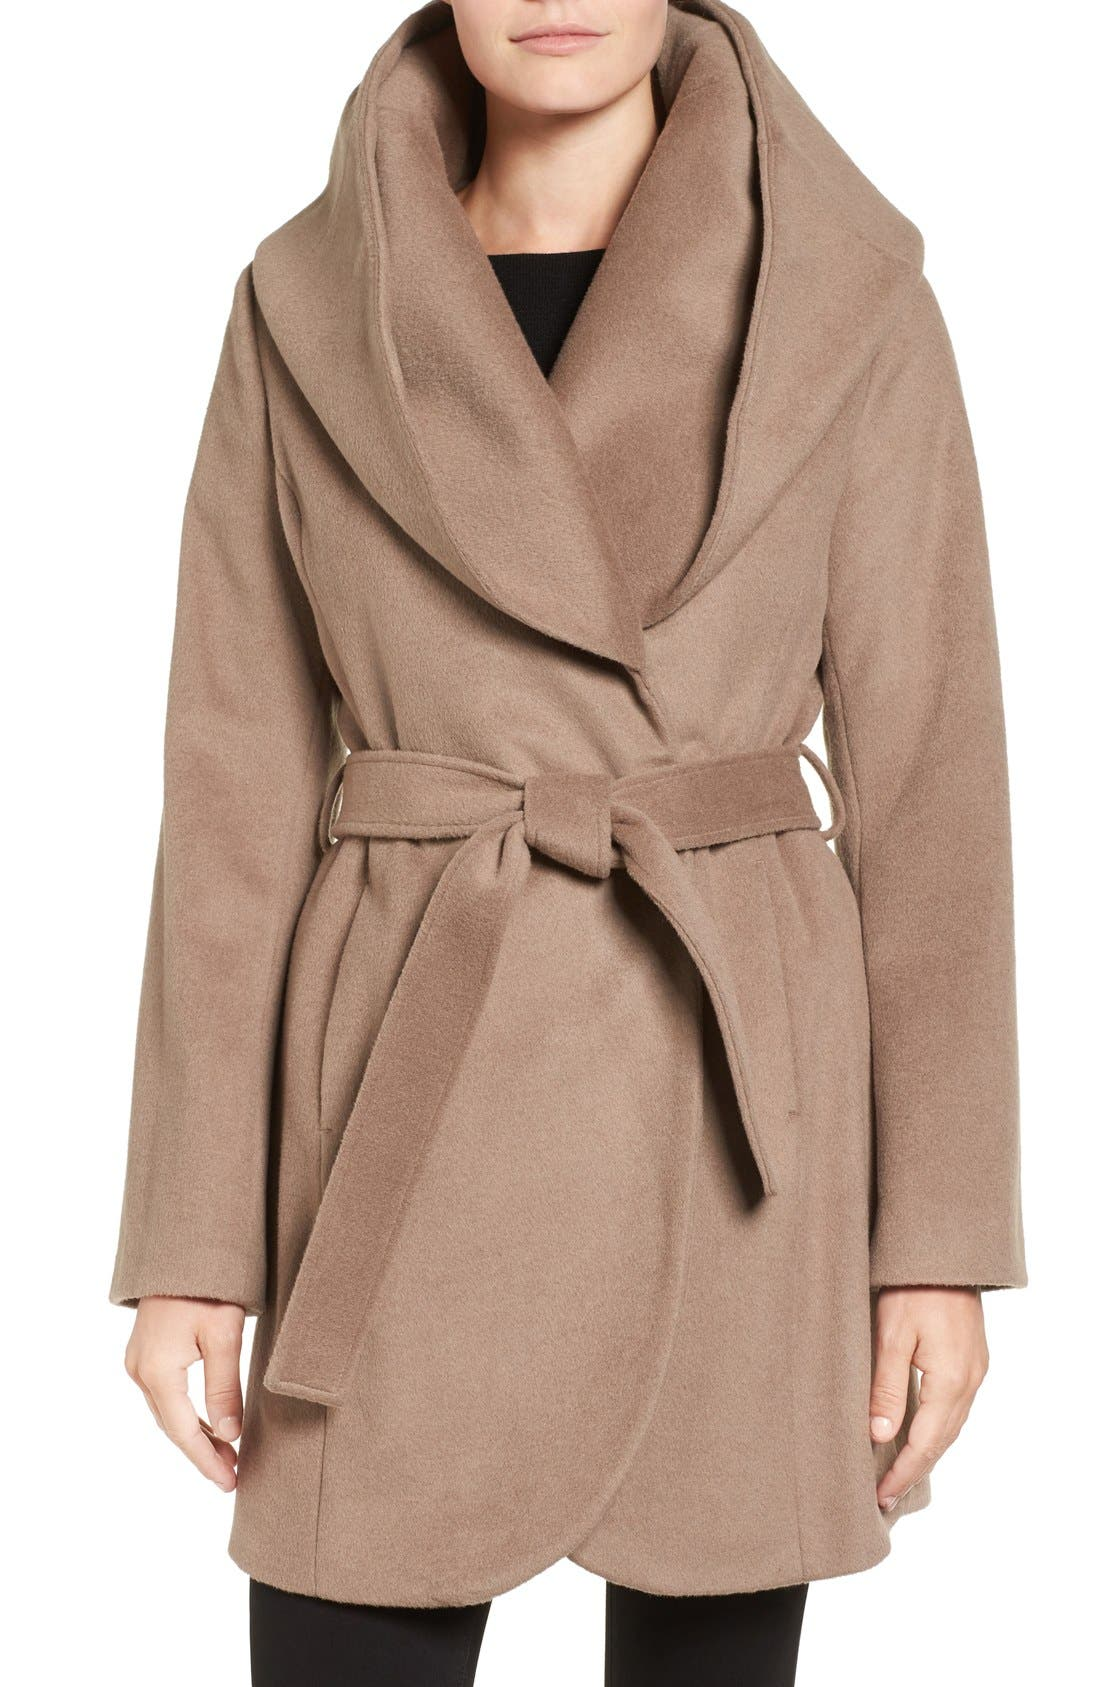 Alternate Image 1 Selected - T Tahari Wool Blend Belted Wrap Coat